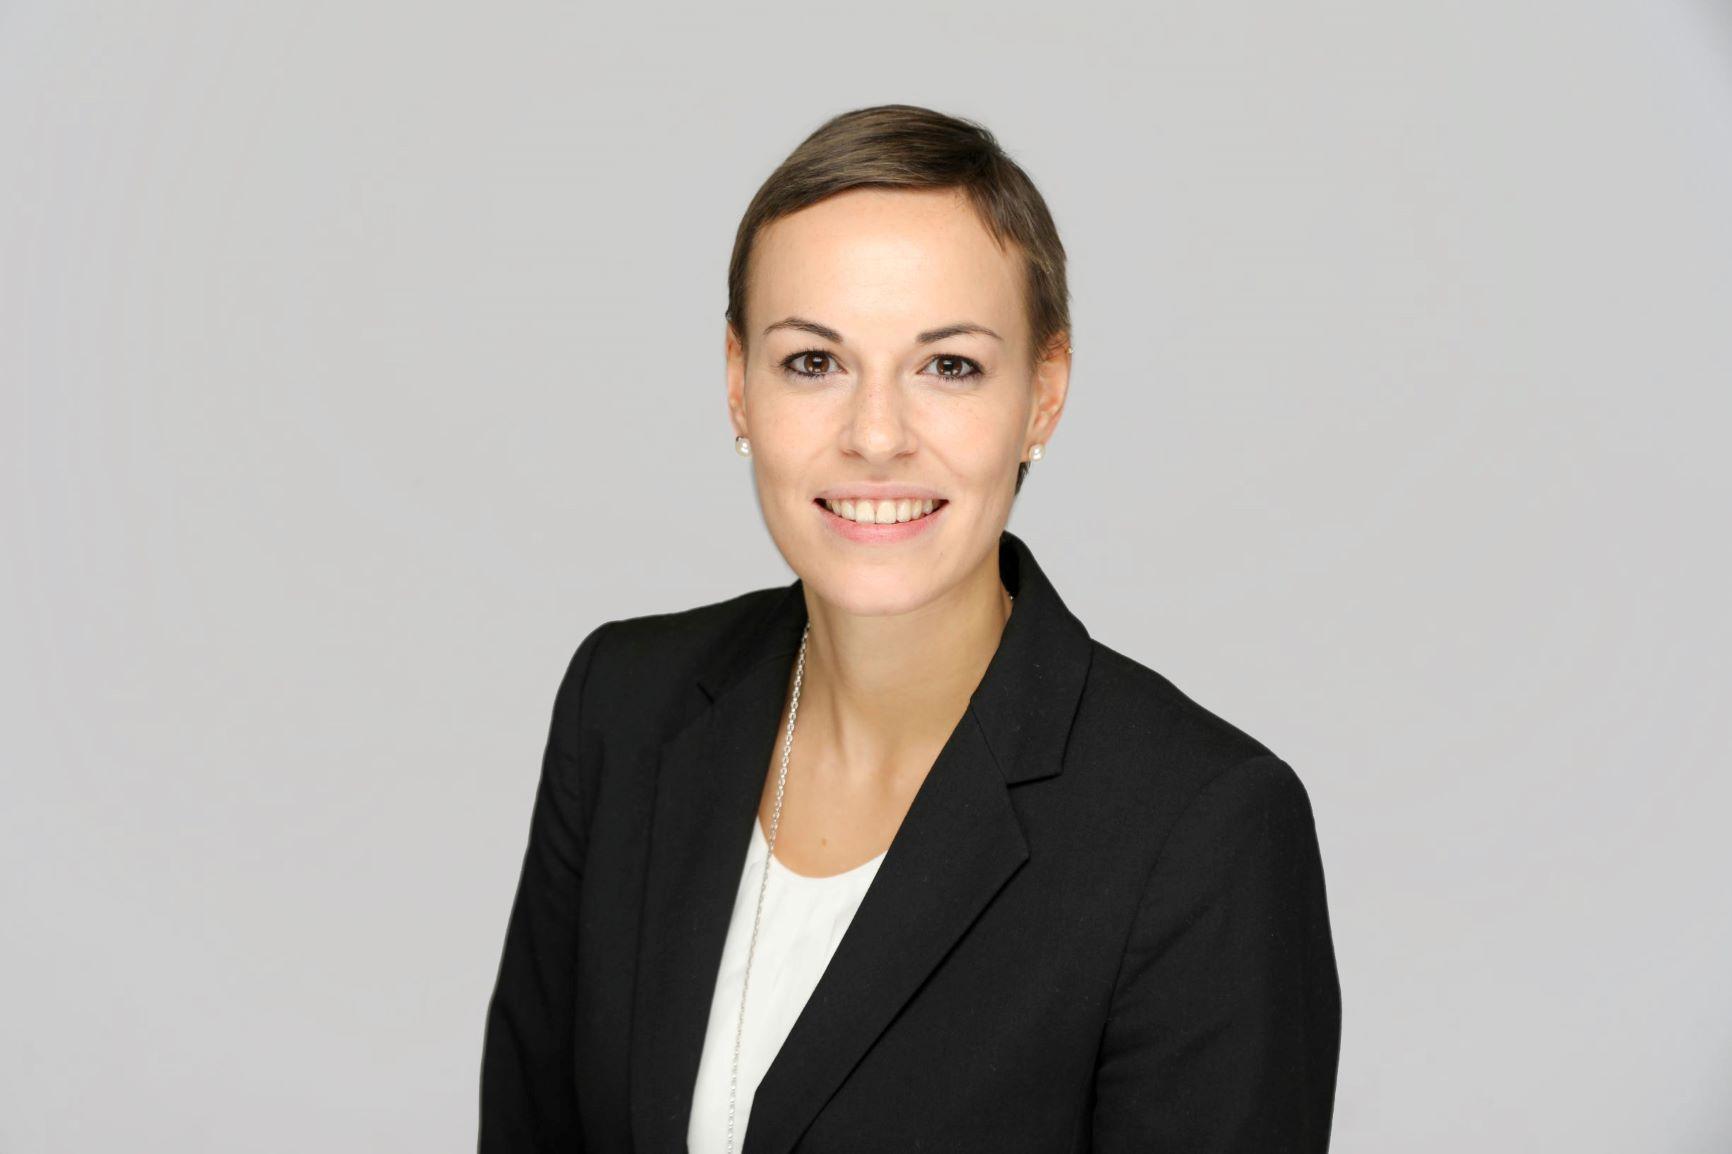 Leslie Burghard